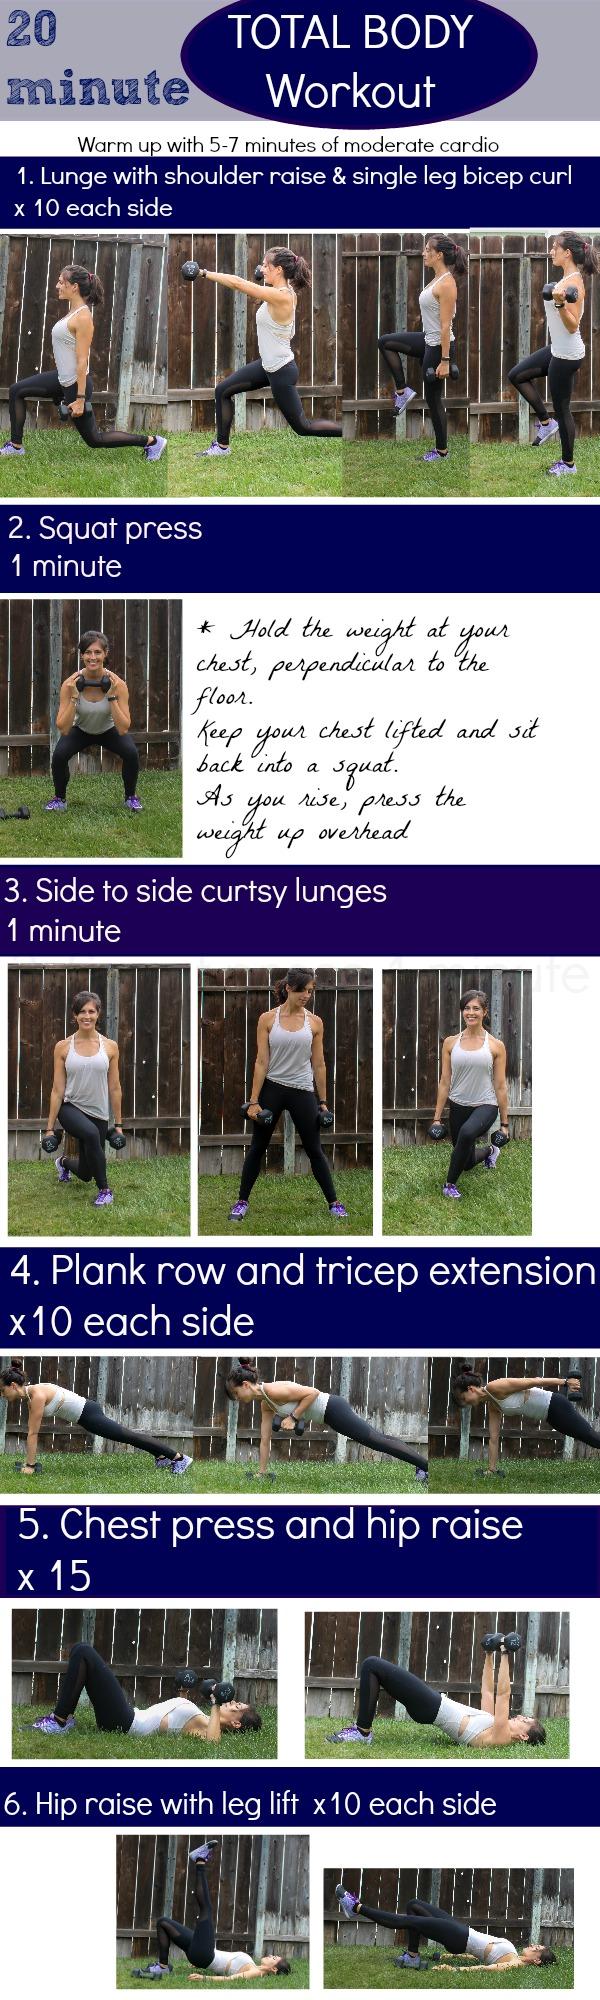 Twenty minute workout